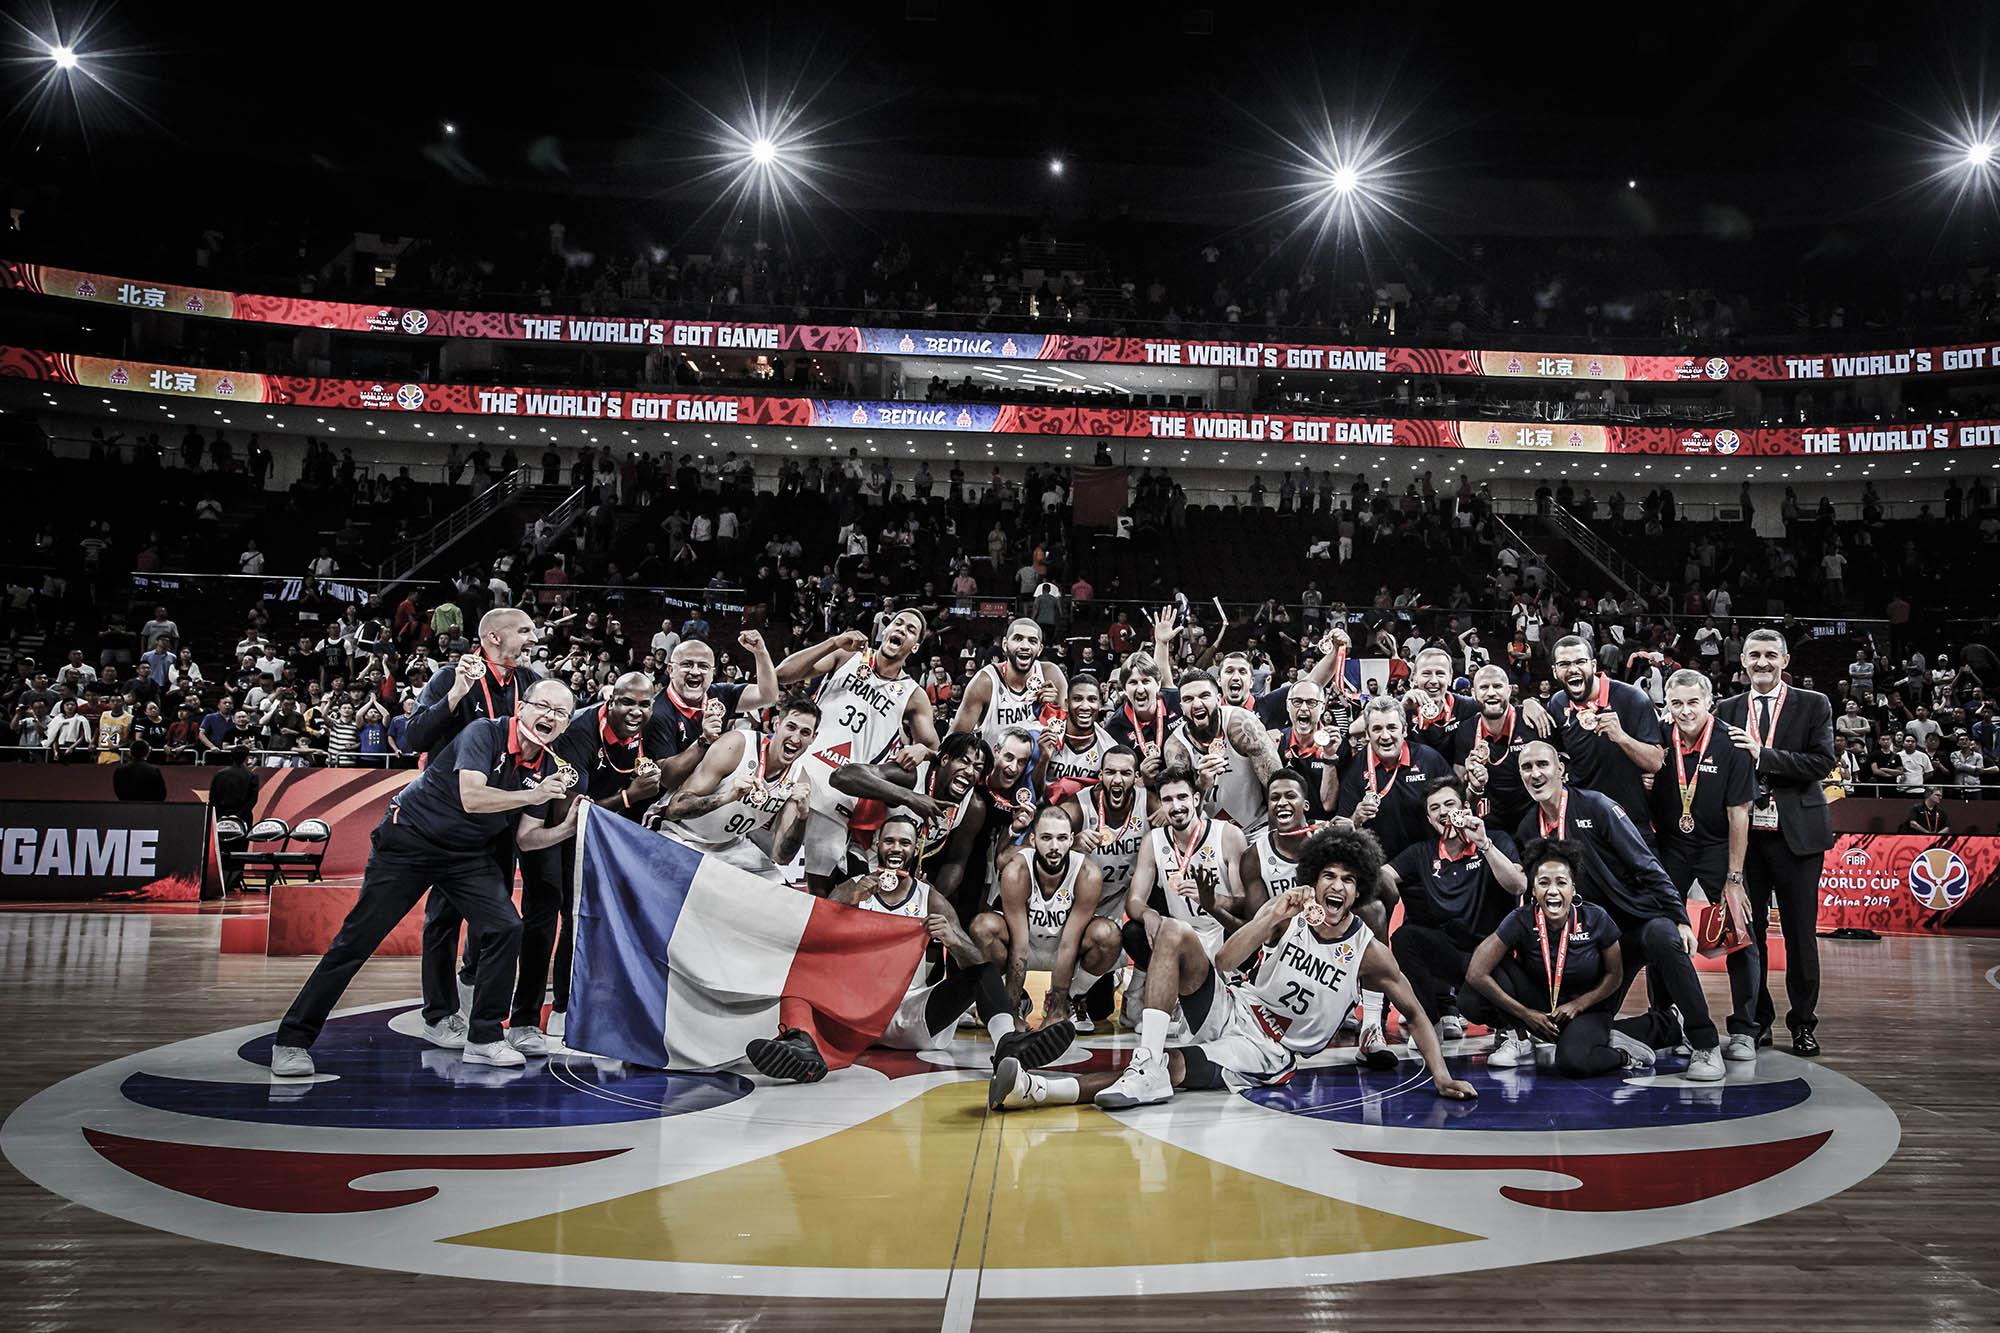 France Team posing